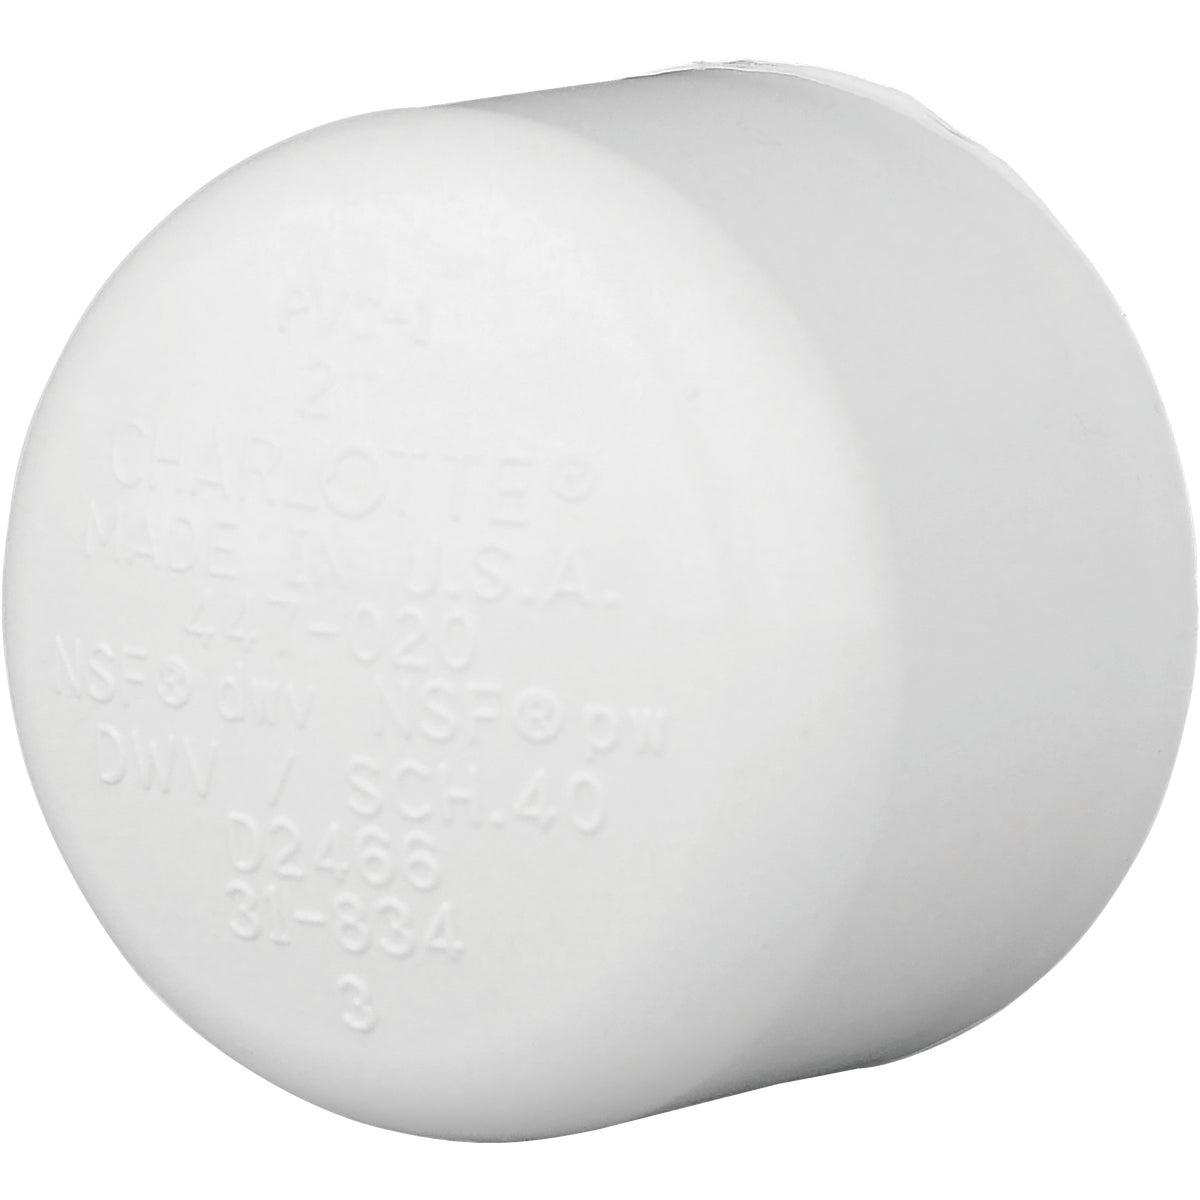 "2"" PVC SCH40 SLIP CAP - 30152 by Genova Inc"